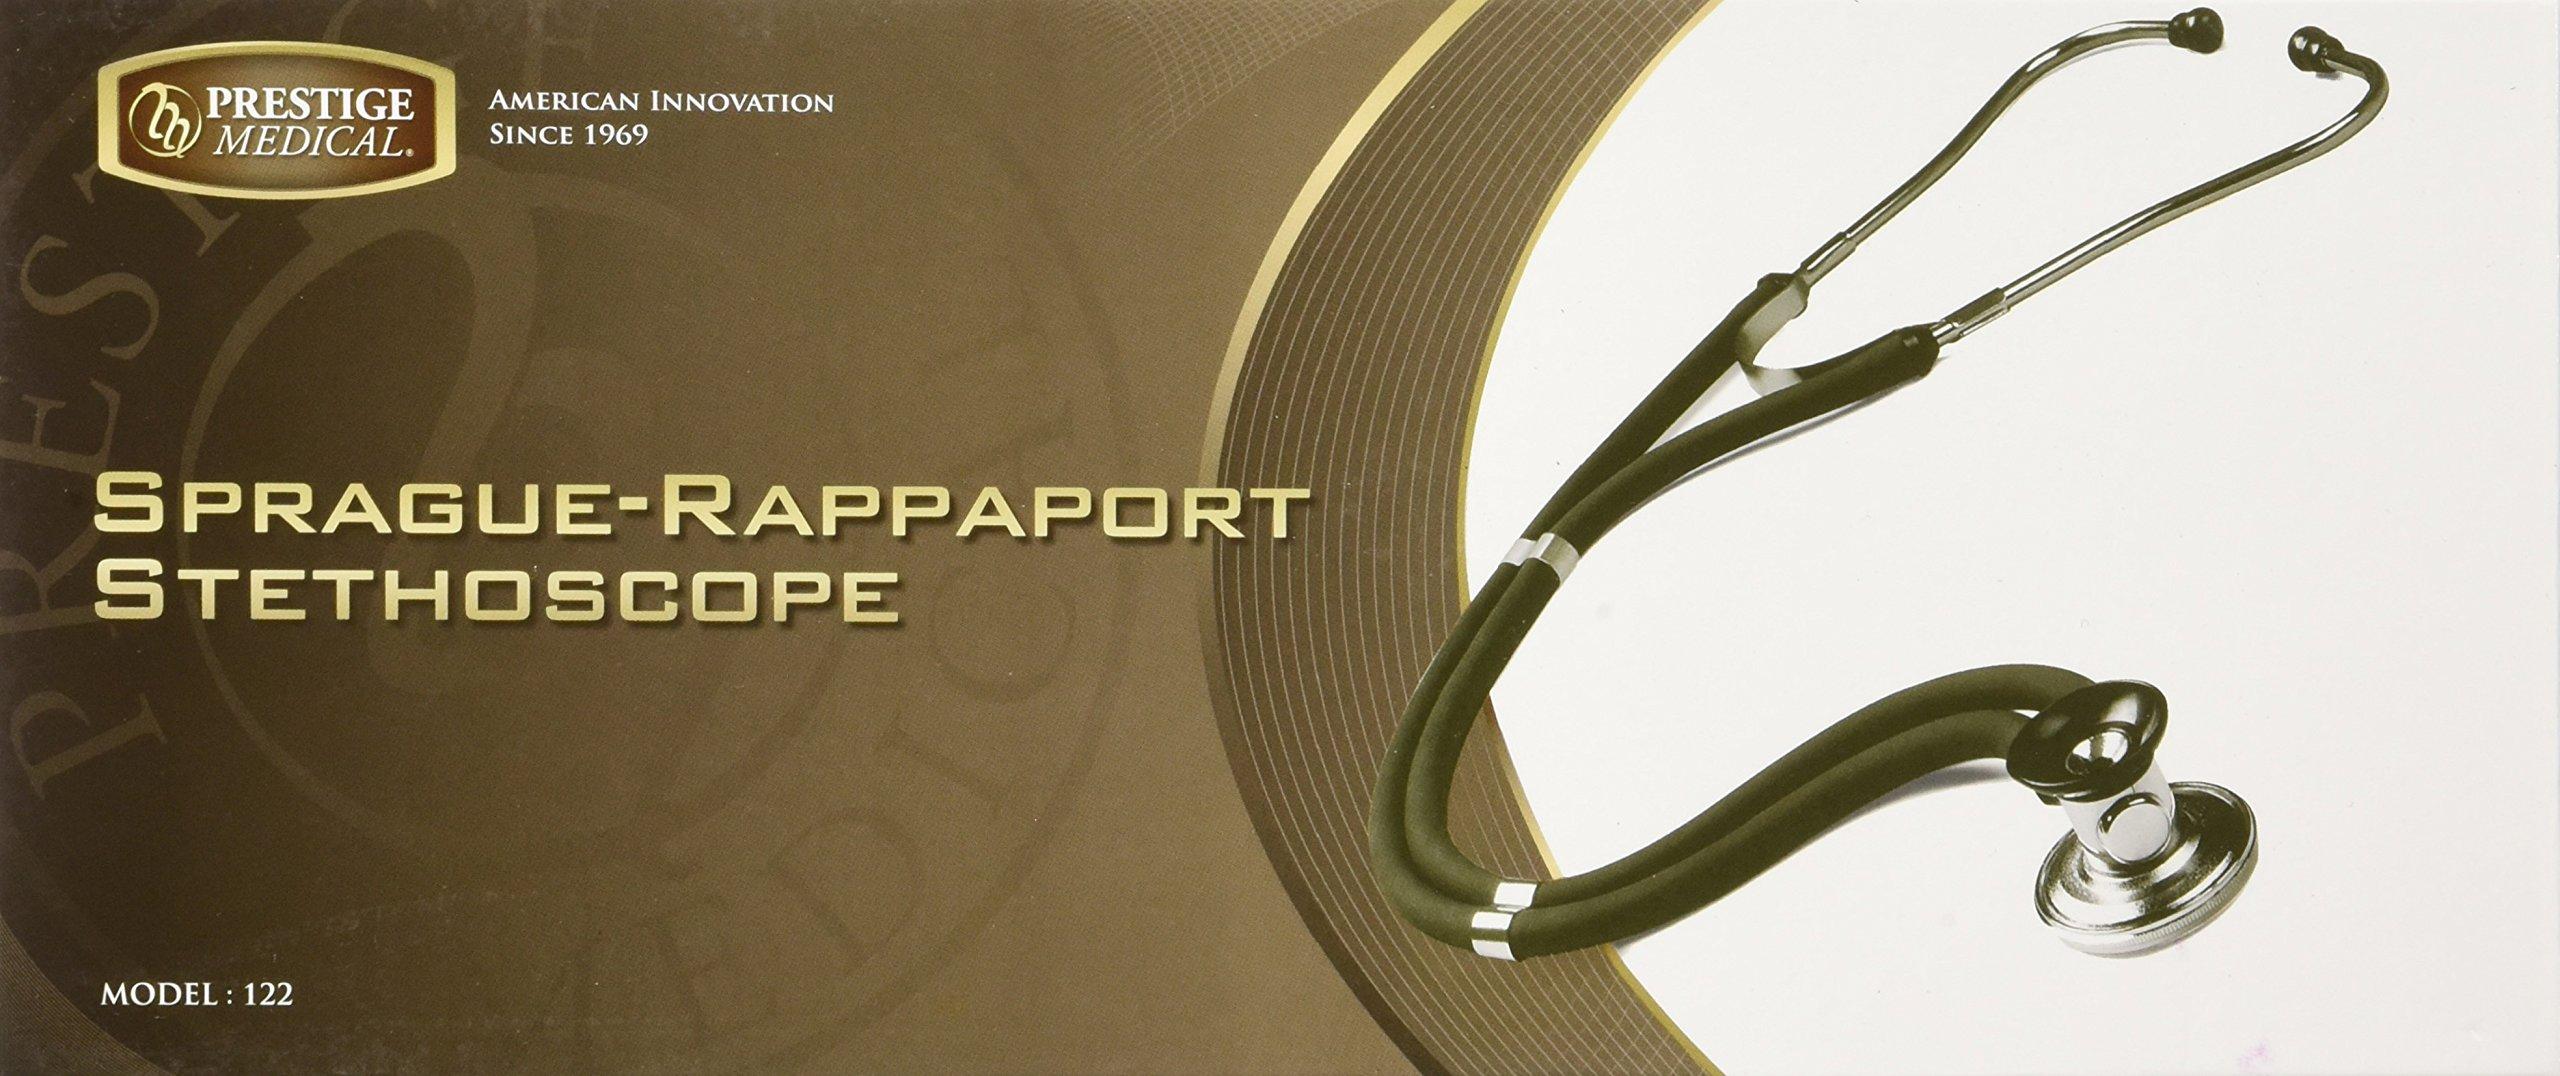 Prestige Medical 122 Sprague Stethoscope, Neon Green